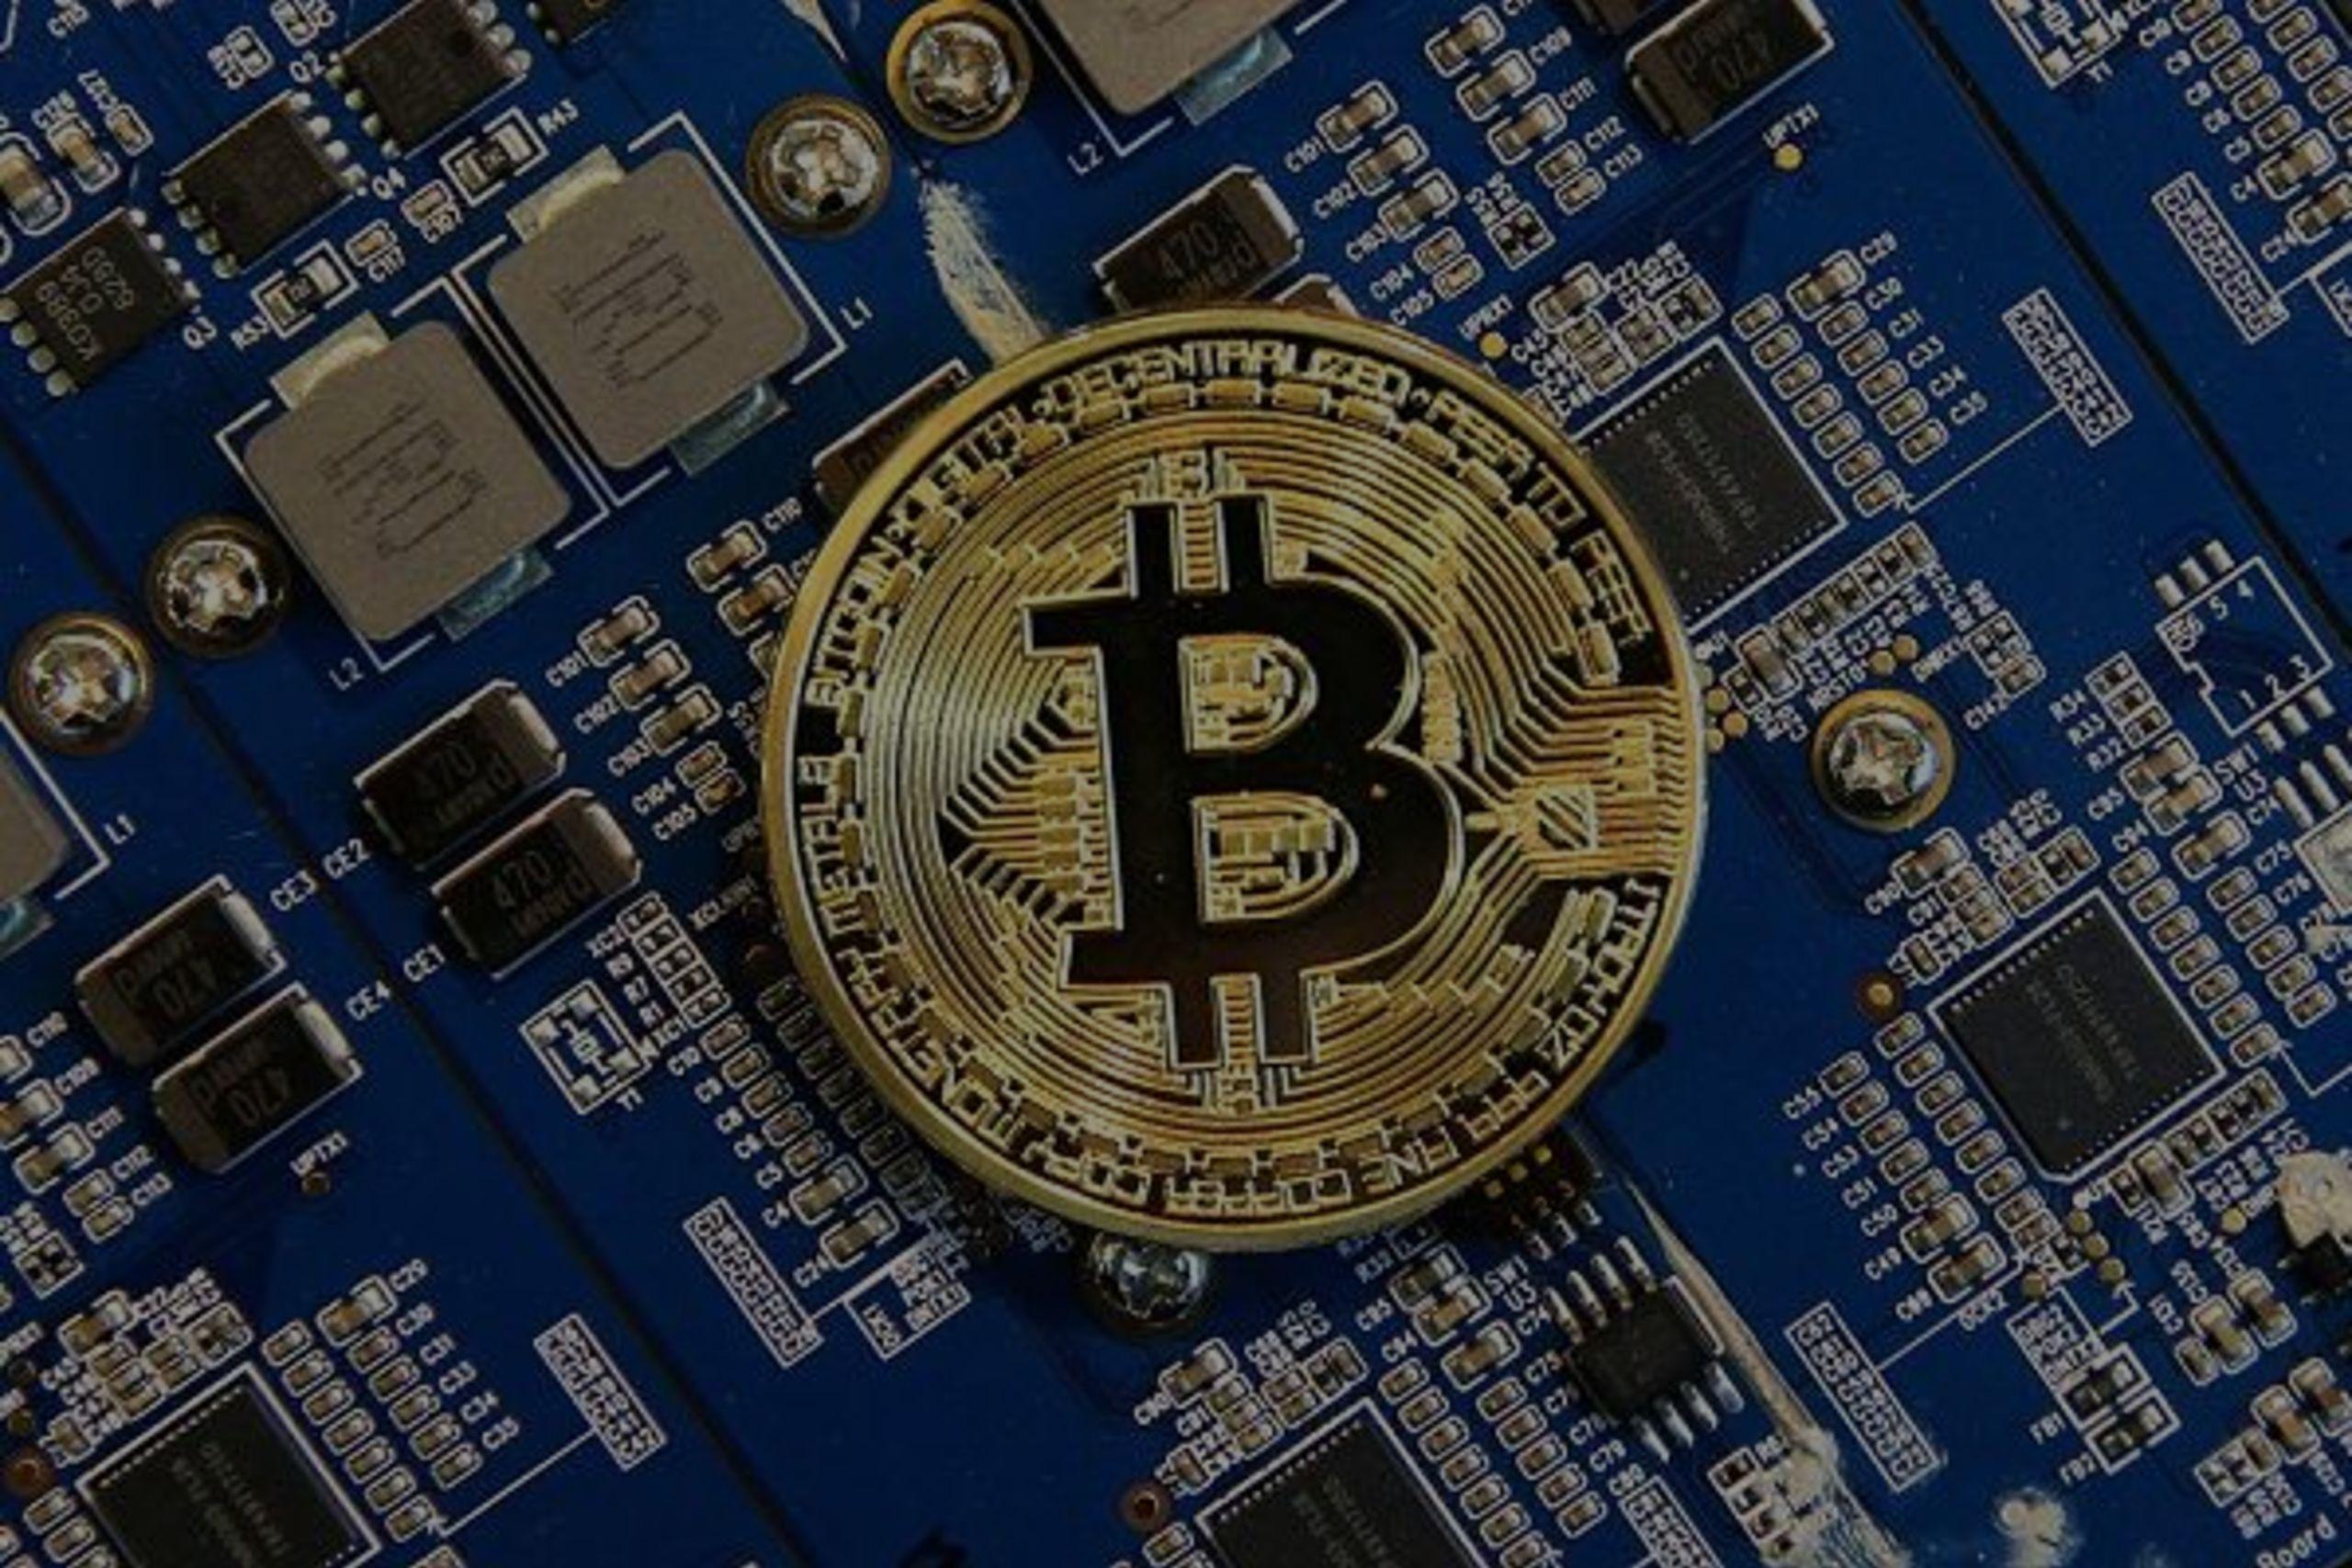 Will Bitcoin Fever Affect Boynton Beach Homeowners?